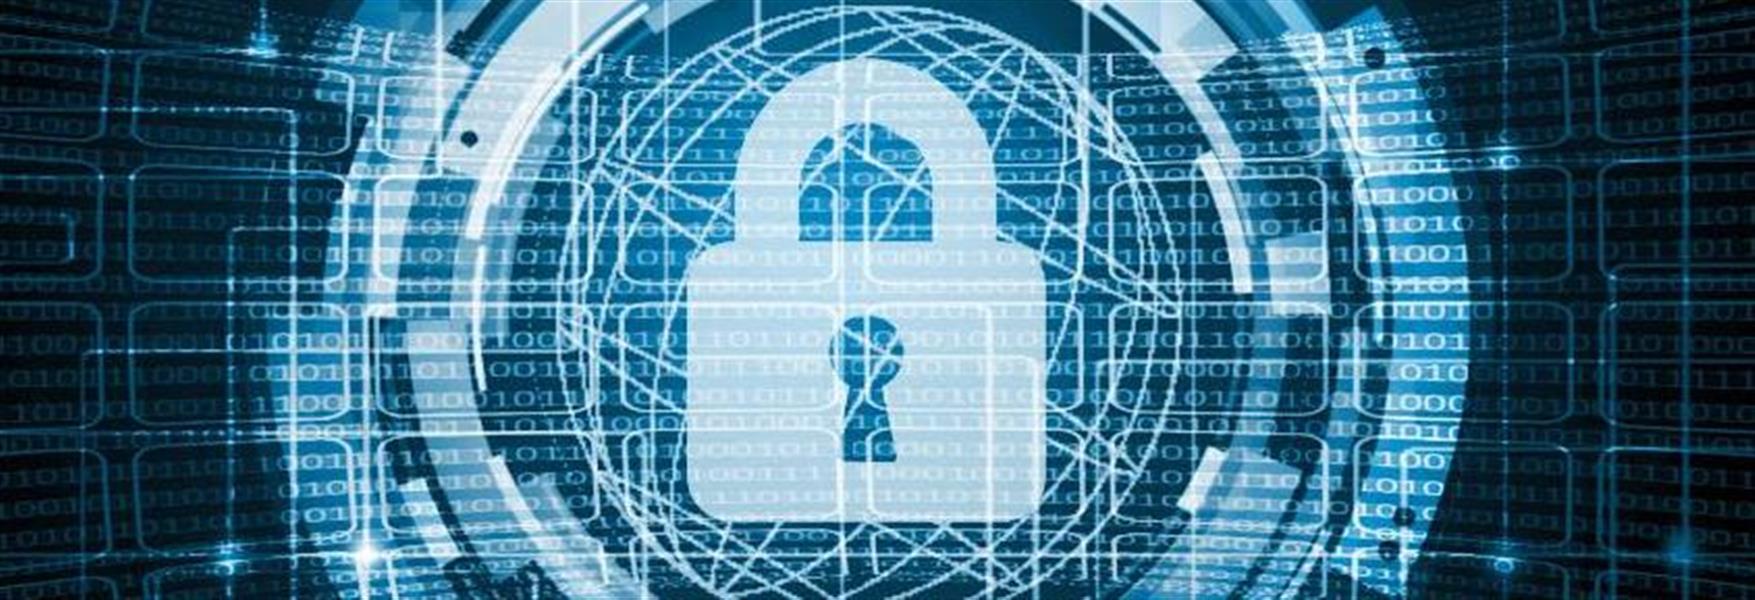 52de87c6-9d2d-47af-8e68-b2cd423ca2d2_cyber-security-illustration.jpg